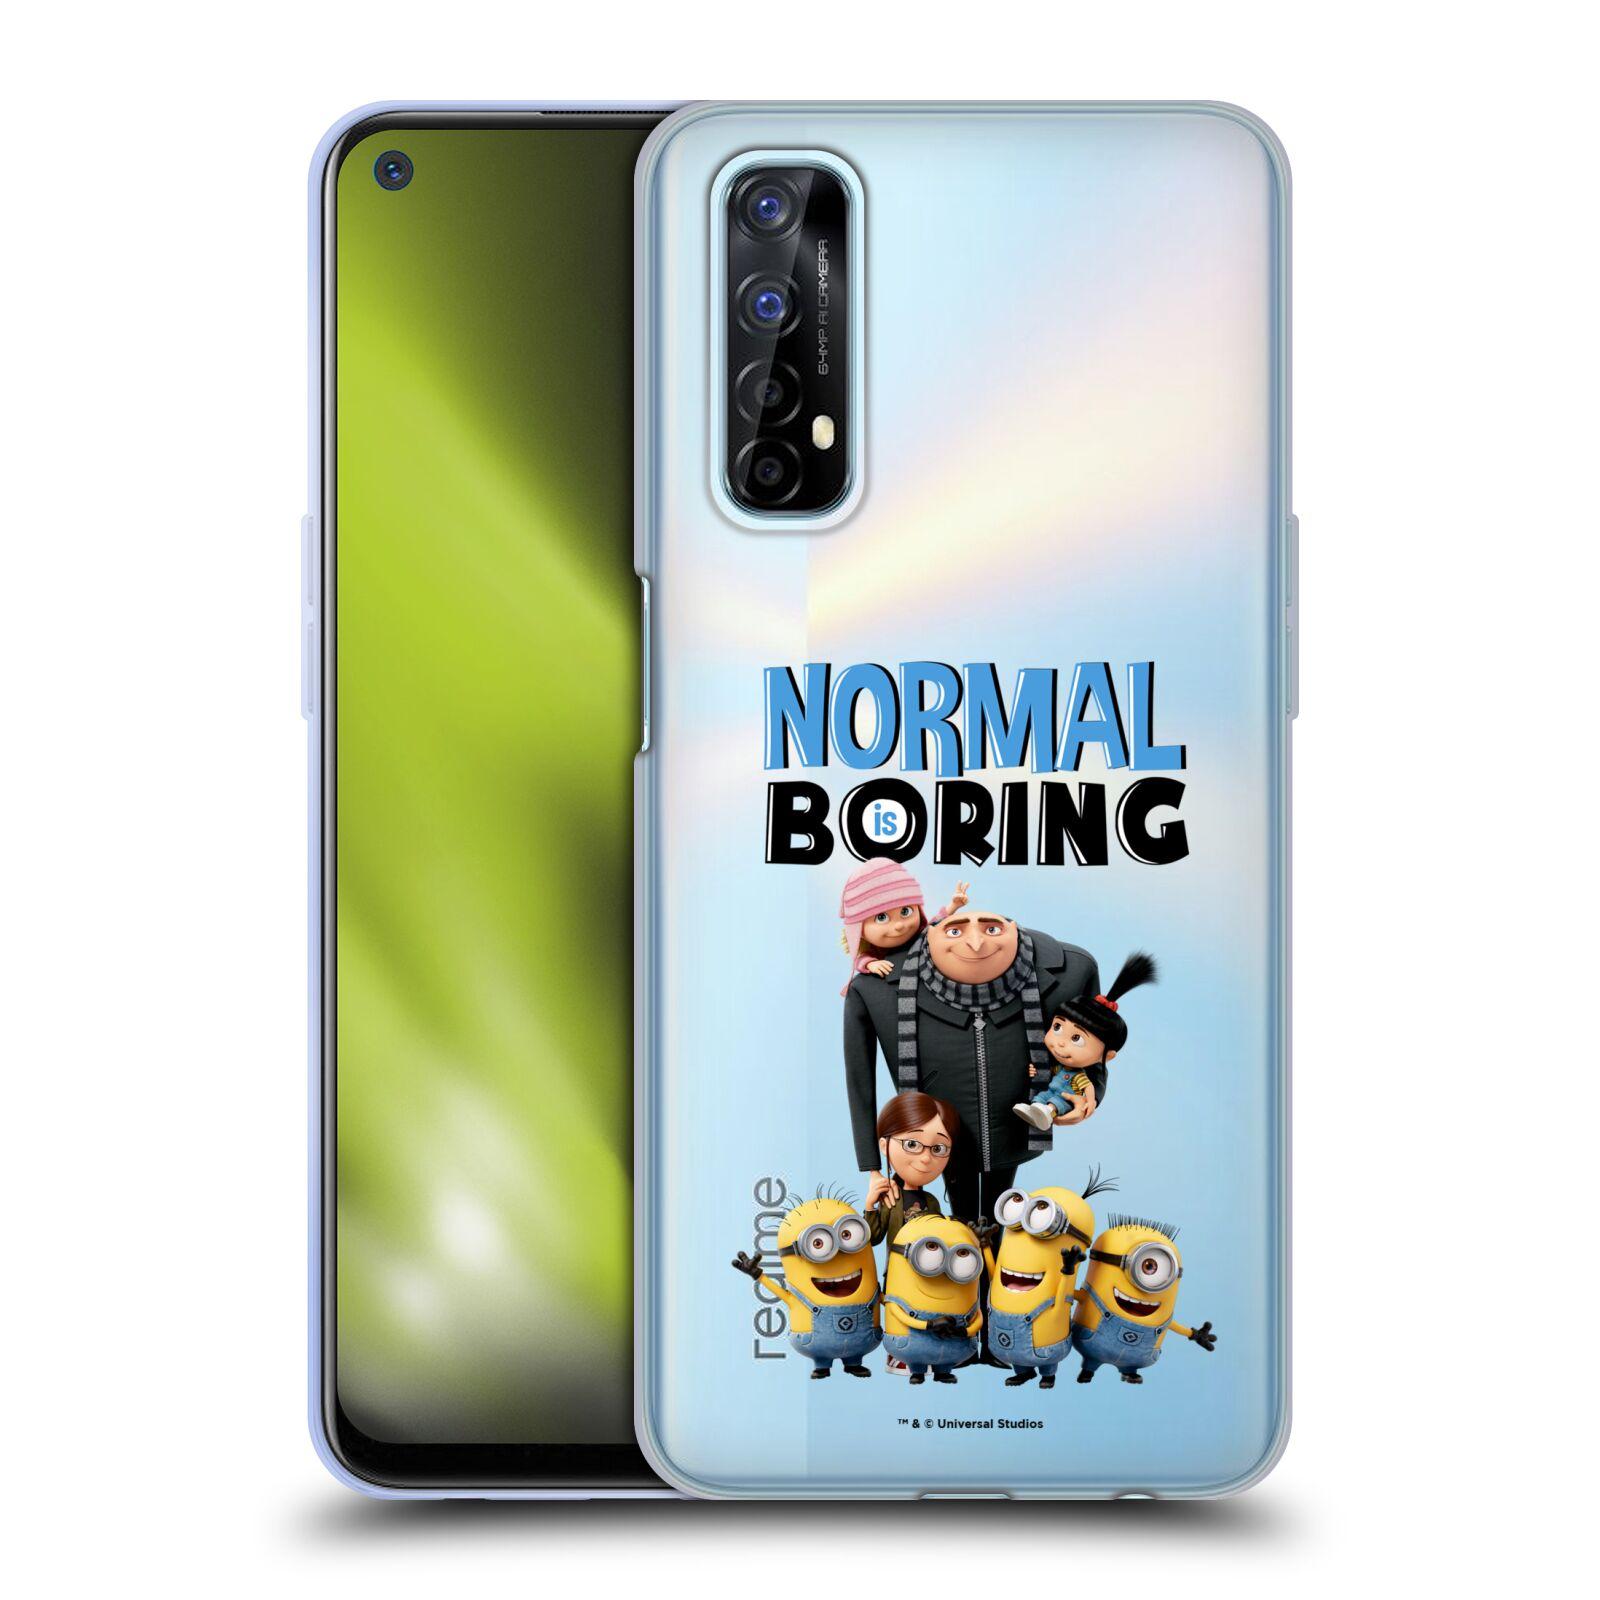 Silikonové pouzdro na mobil Realme 7 - Head Case - Normal is boring z filmu Já, padouch - Despicable Me